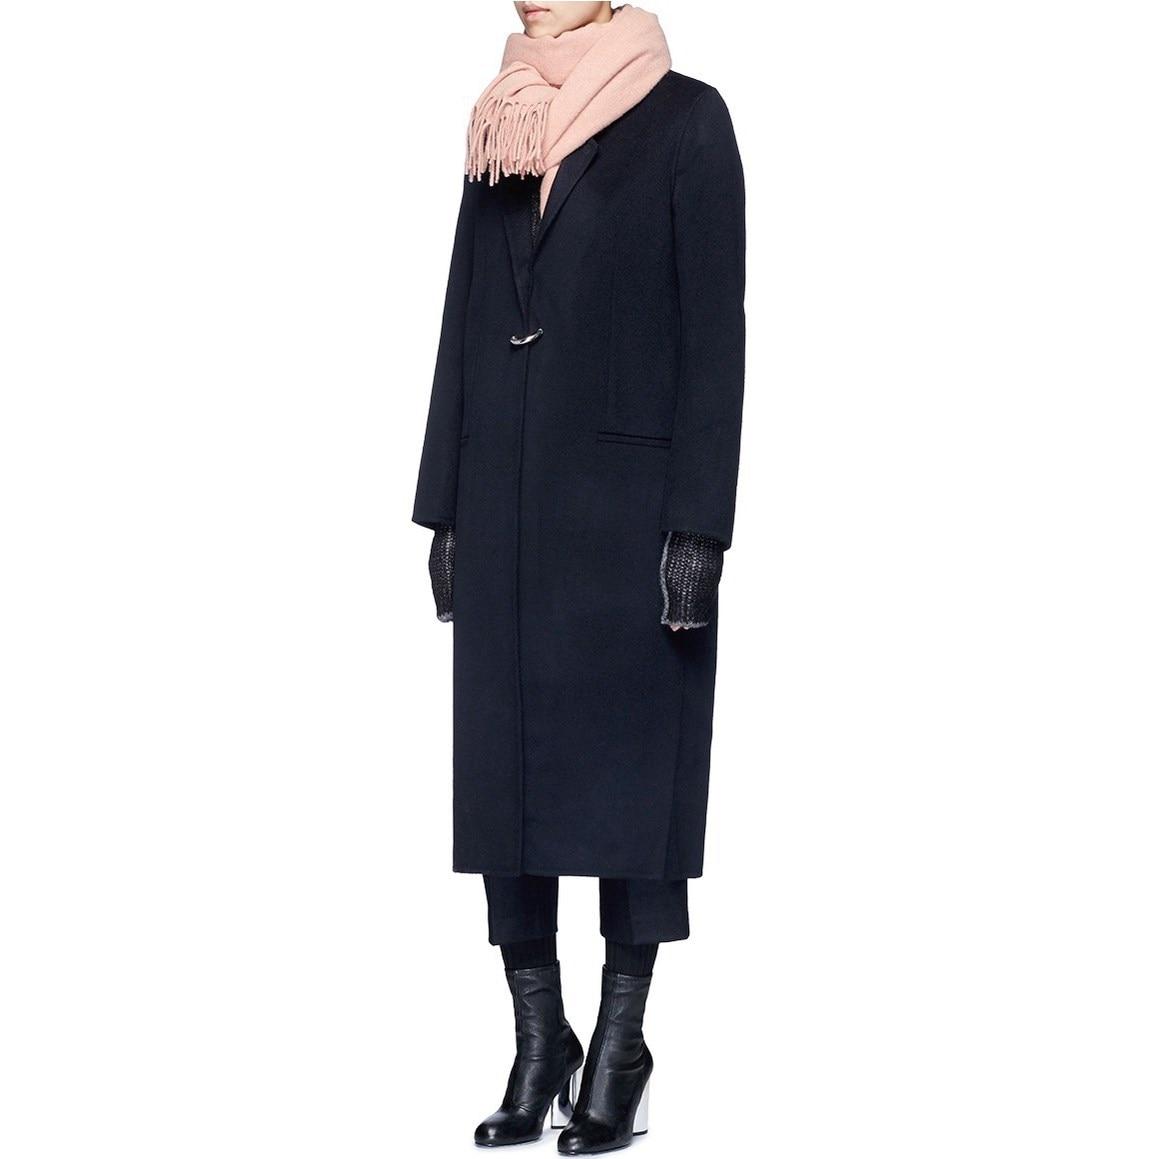 2018 New Autumn Winter Women Long Woolen Coat Fashion Dark Button Plus Size Coat Female Navy Blue Woolen Outerwear